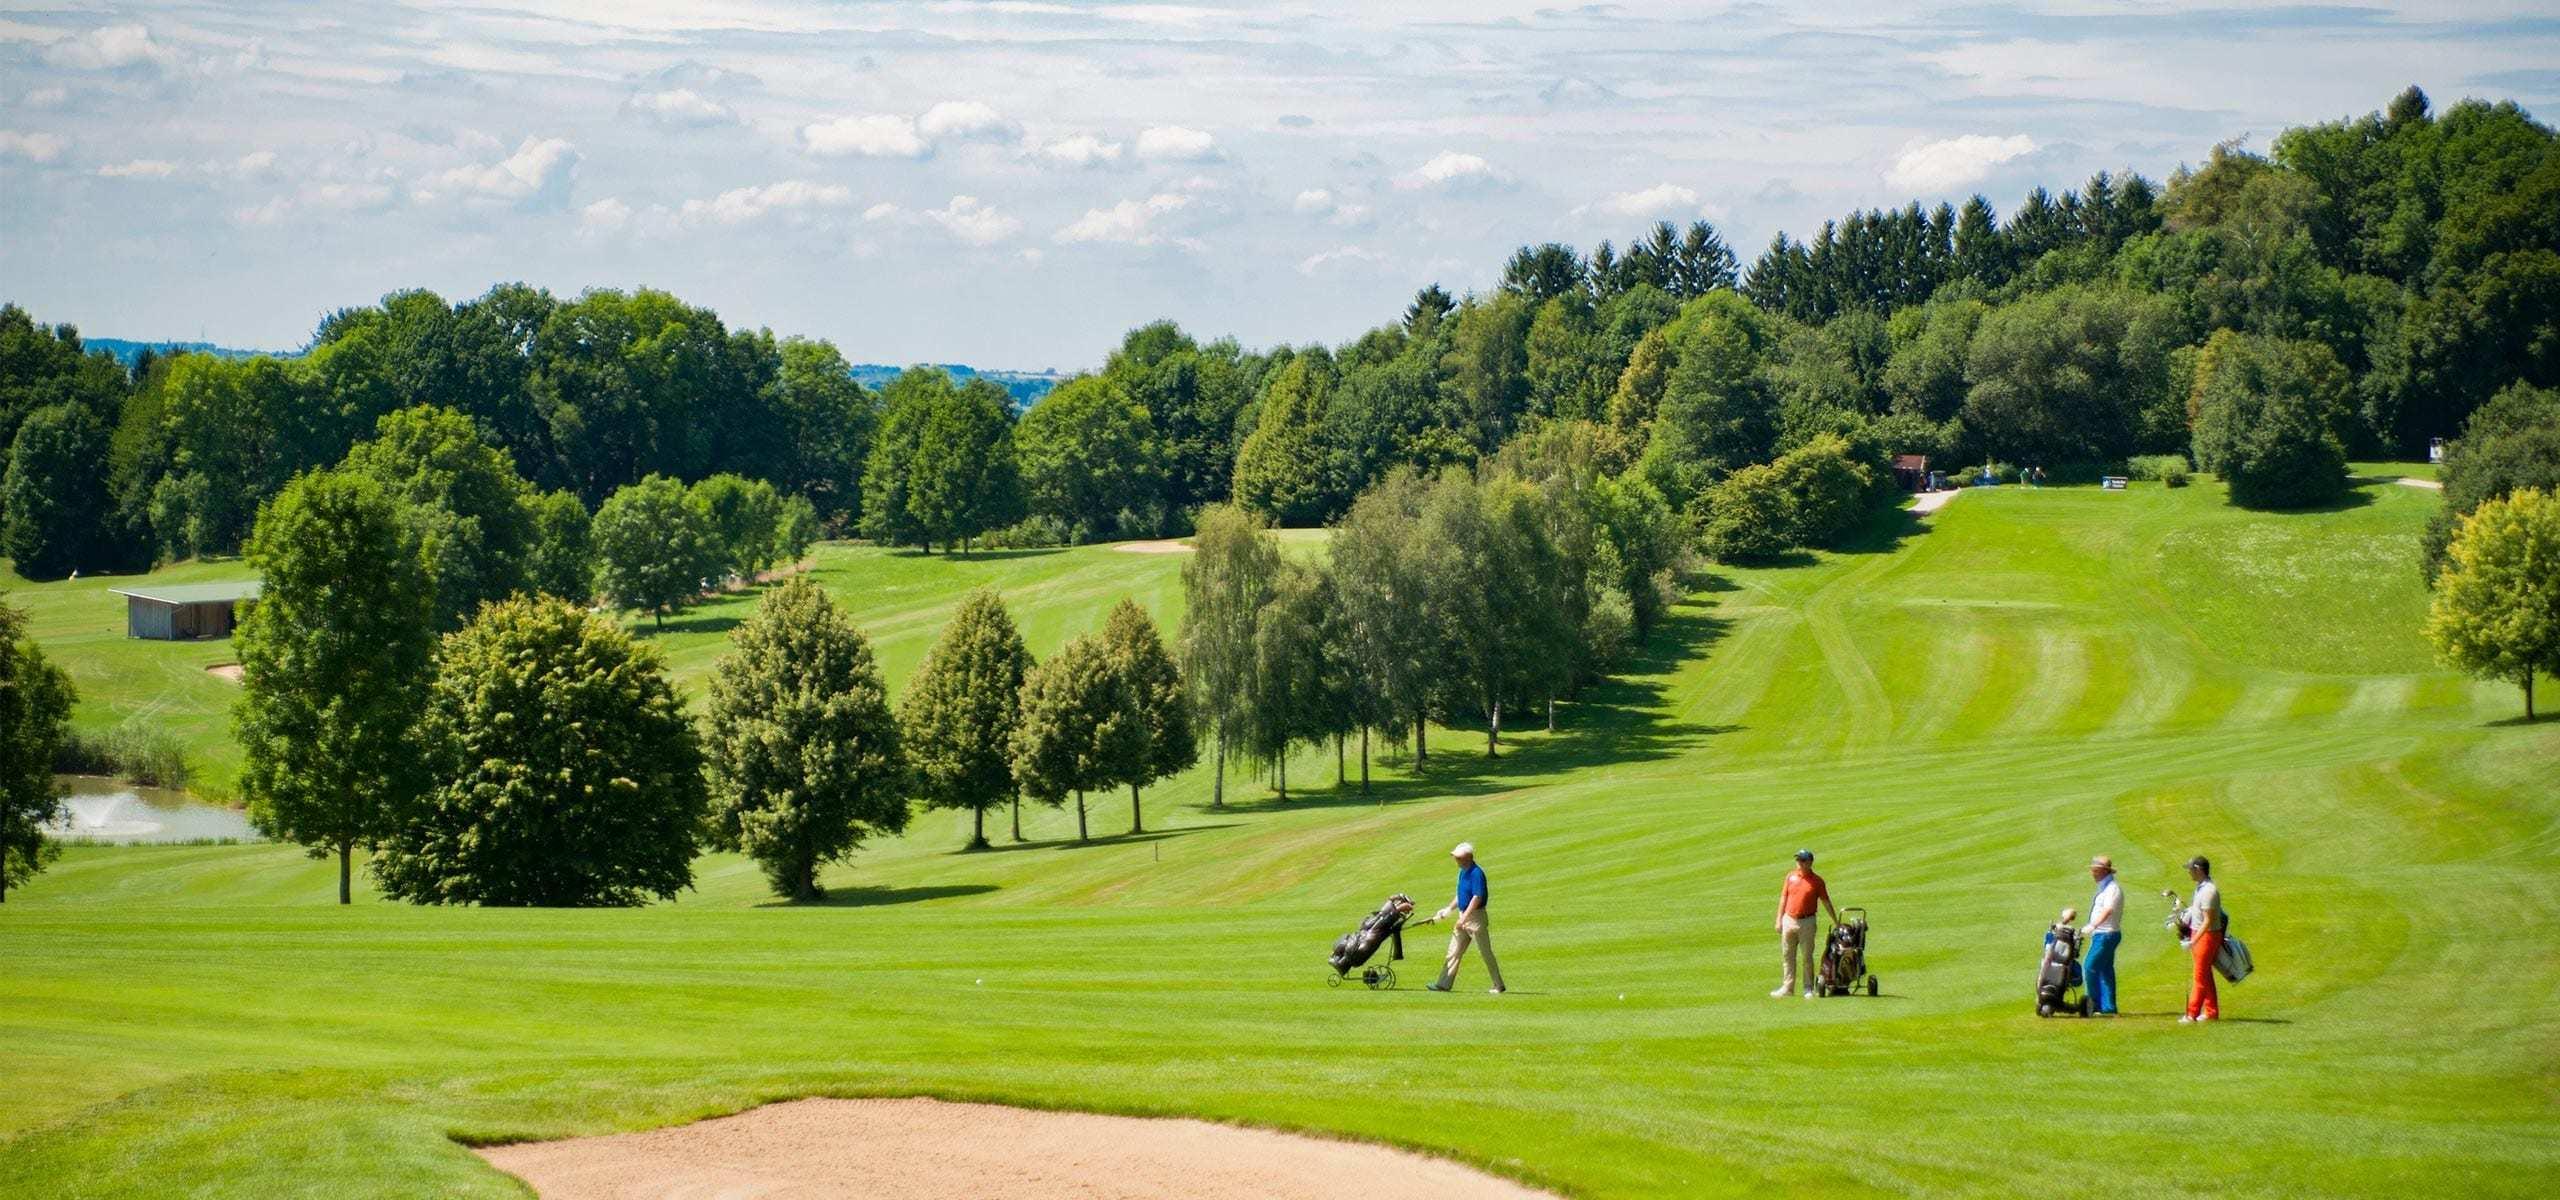 Golfclub Erding Grünbach Bahn 1